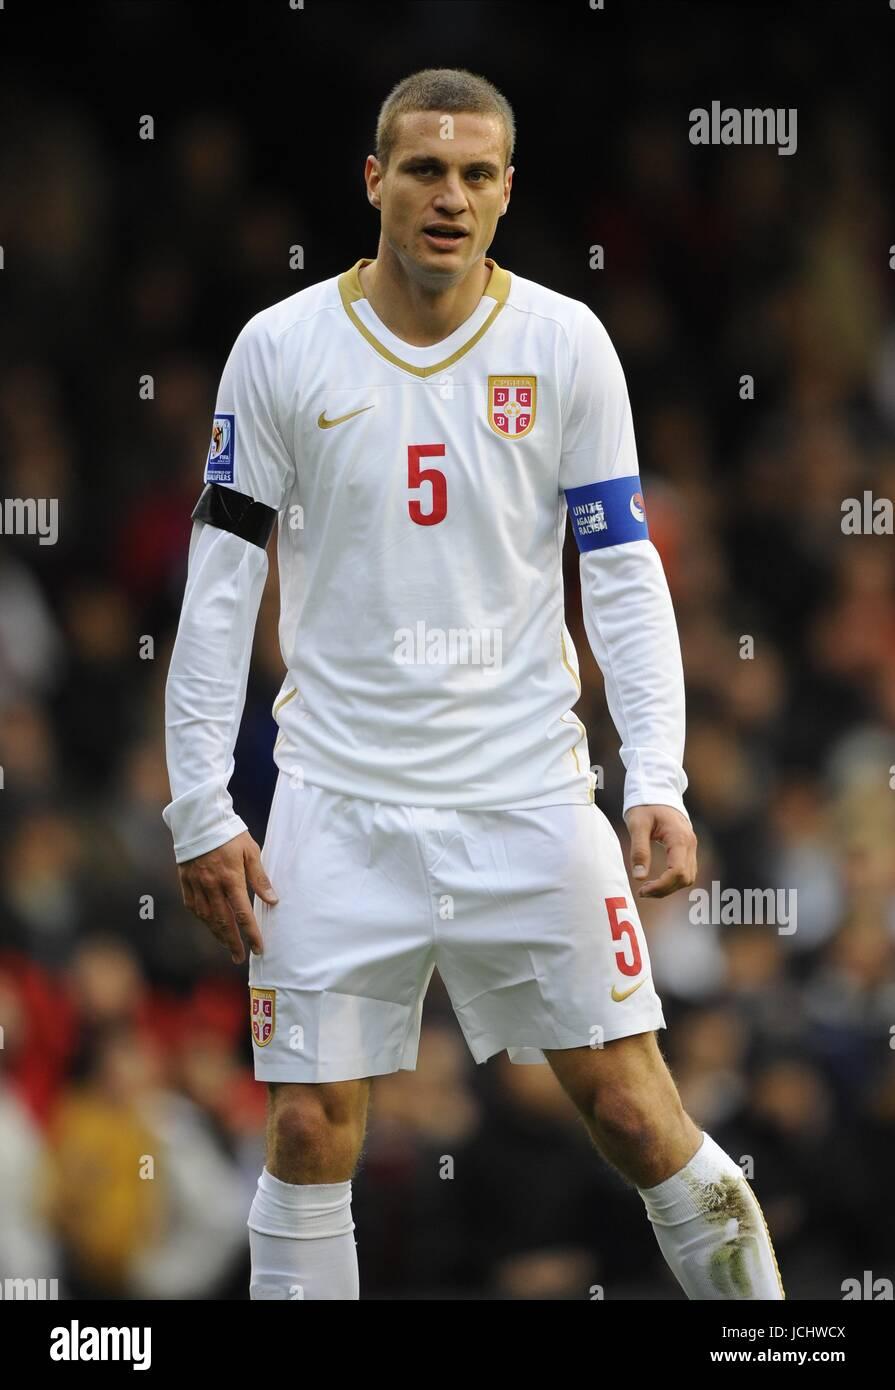 Panini coupe du monde 2006-Nemanja Vidic Serbie et Monténégro No 213